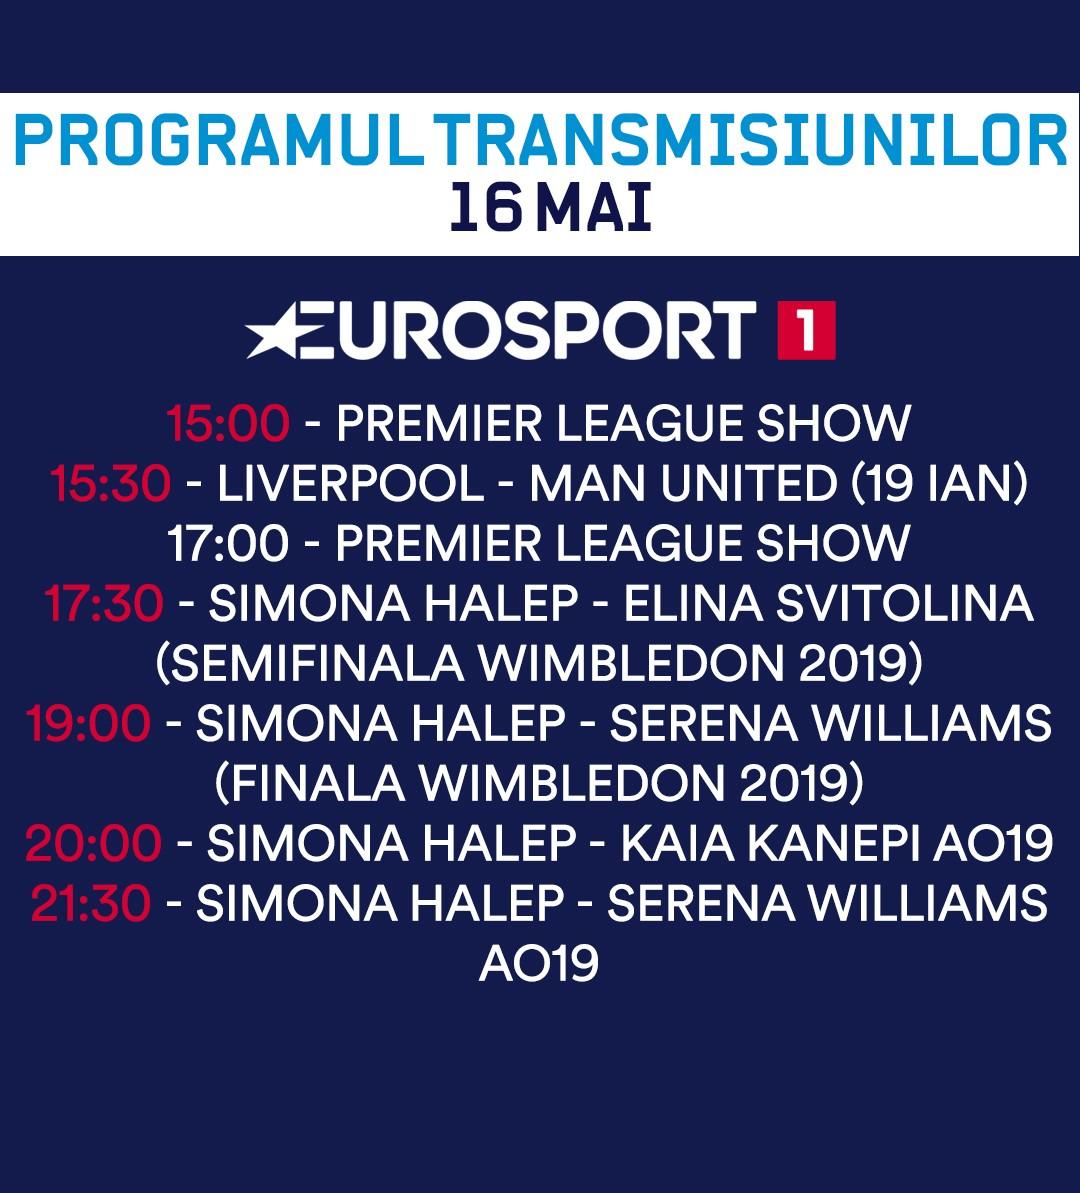 https://i.eurosport.com/2020/05/16/2819489.jpg